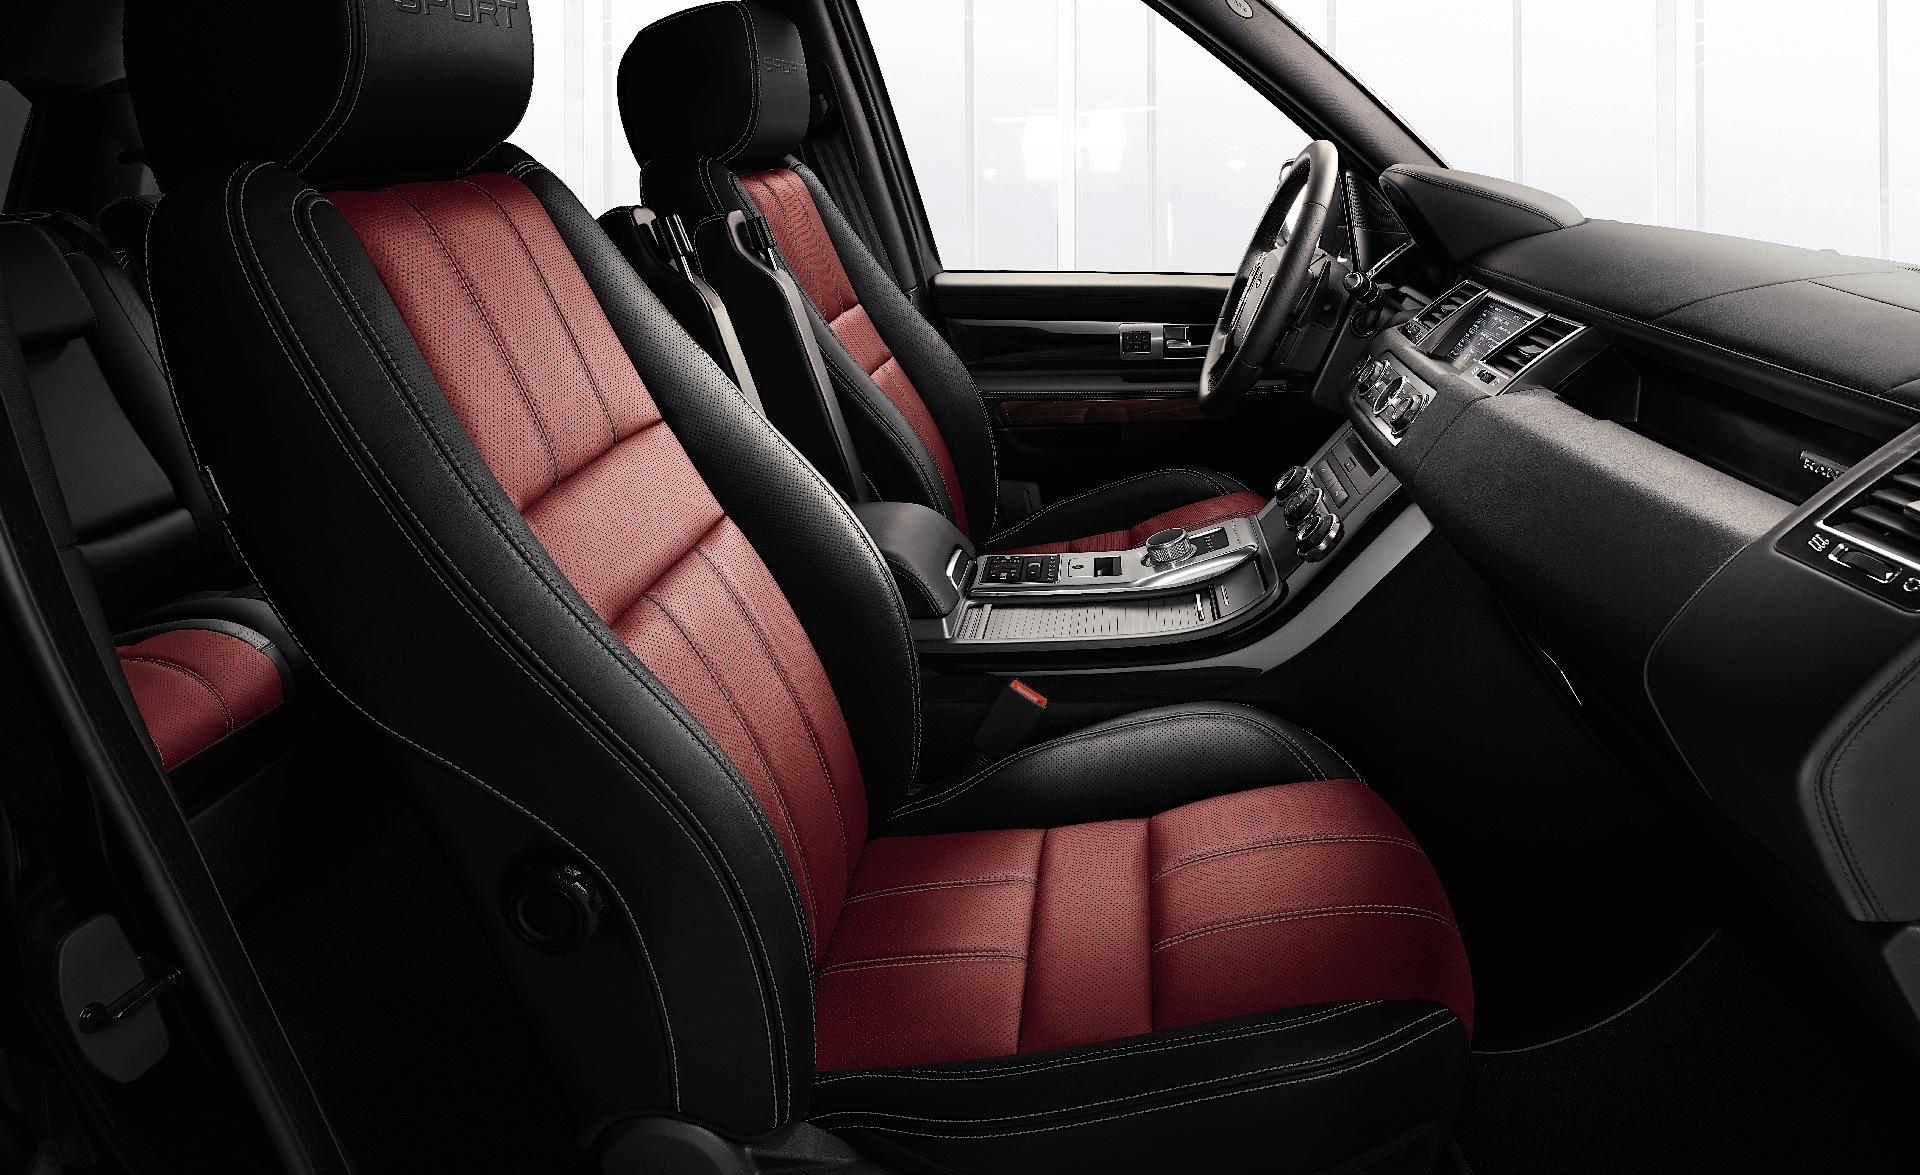 LAND ROVER Range Rover Sport specs 2009 2010 2011 2012 2013